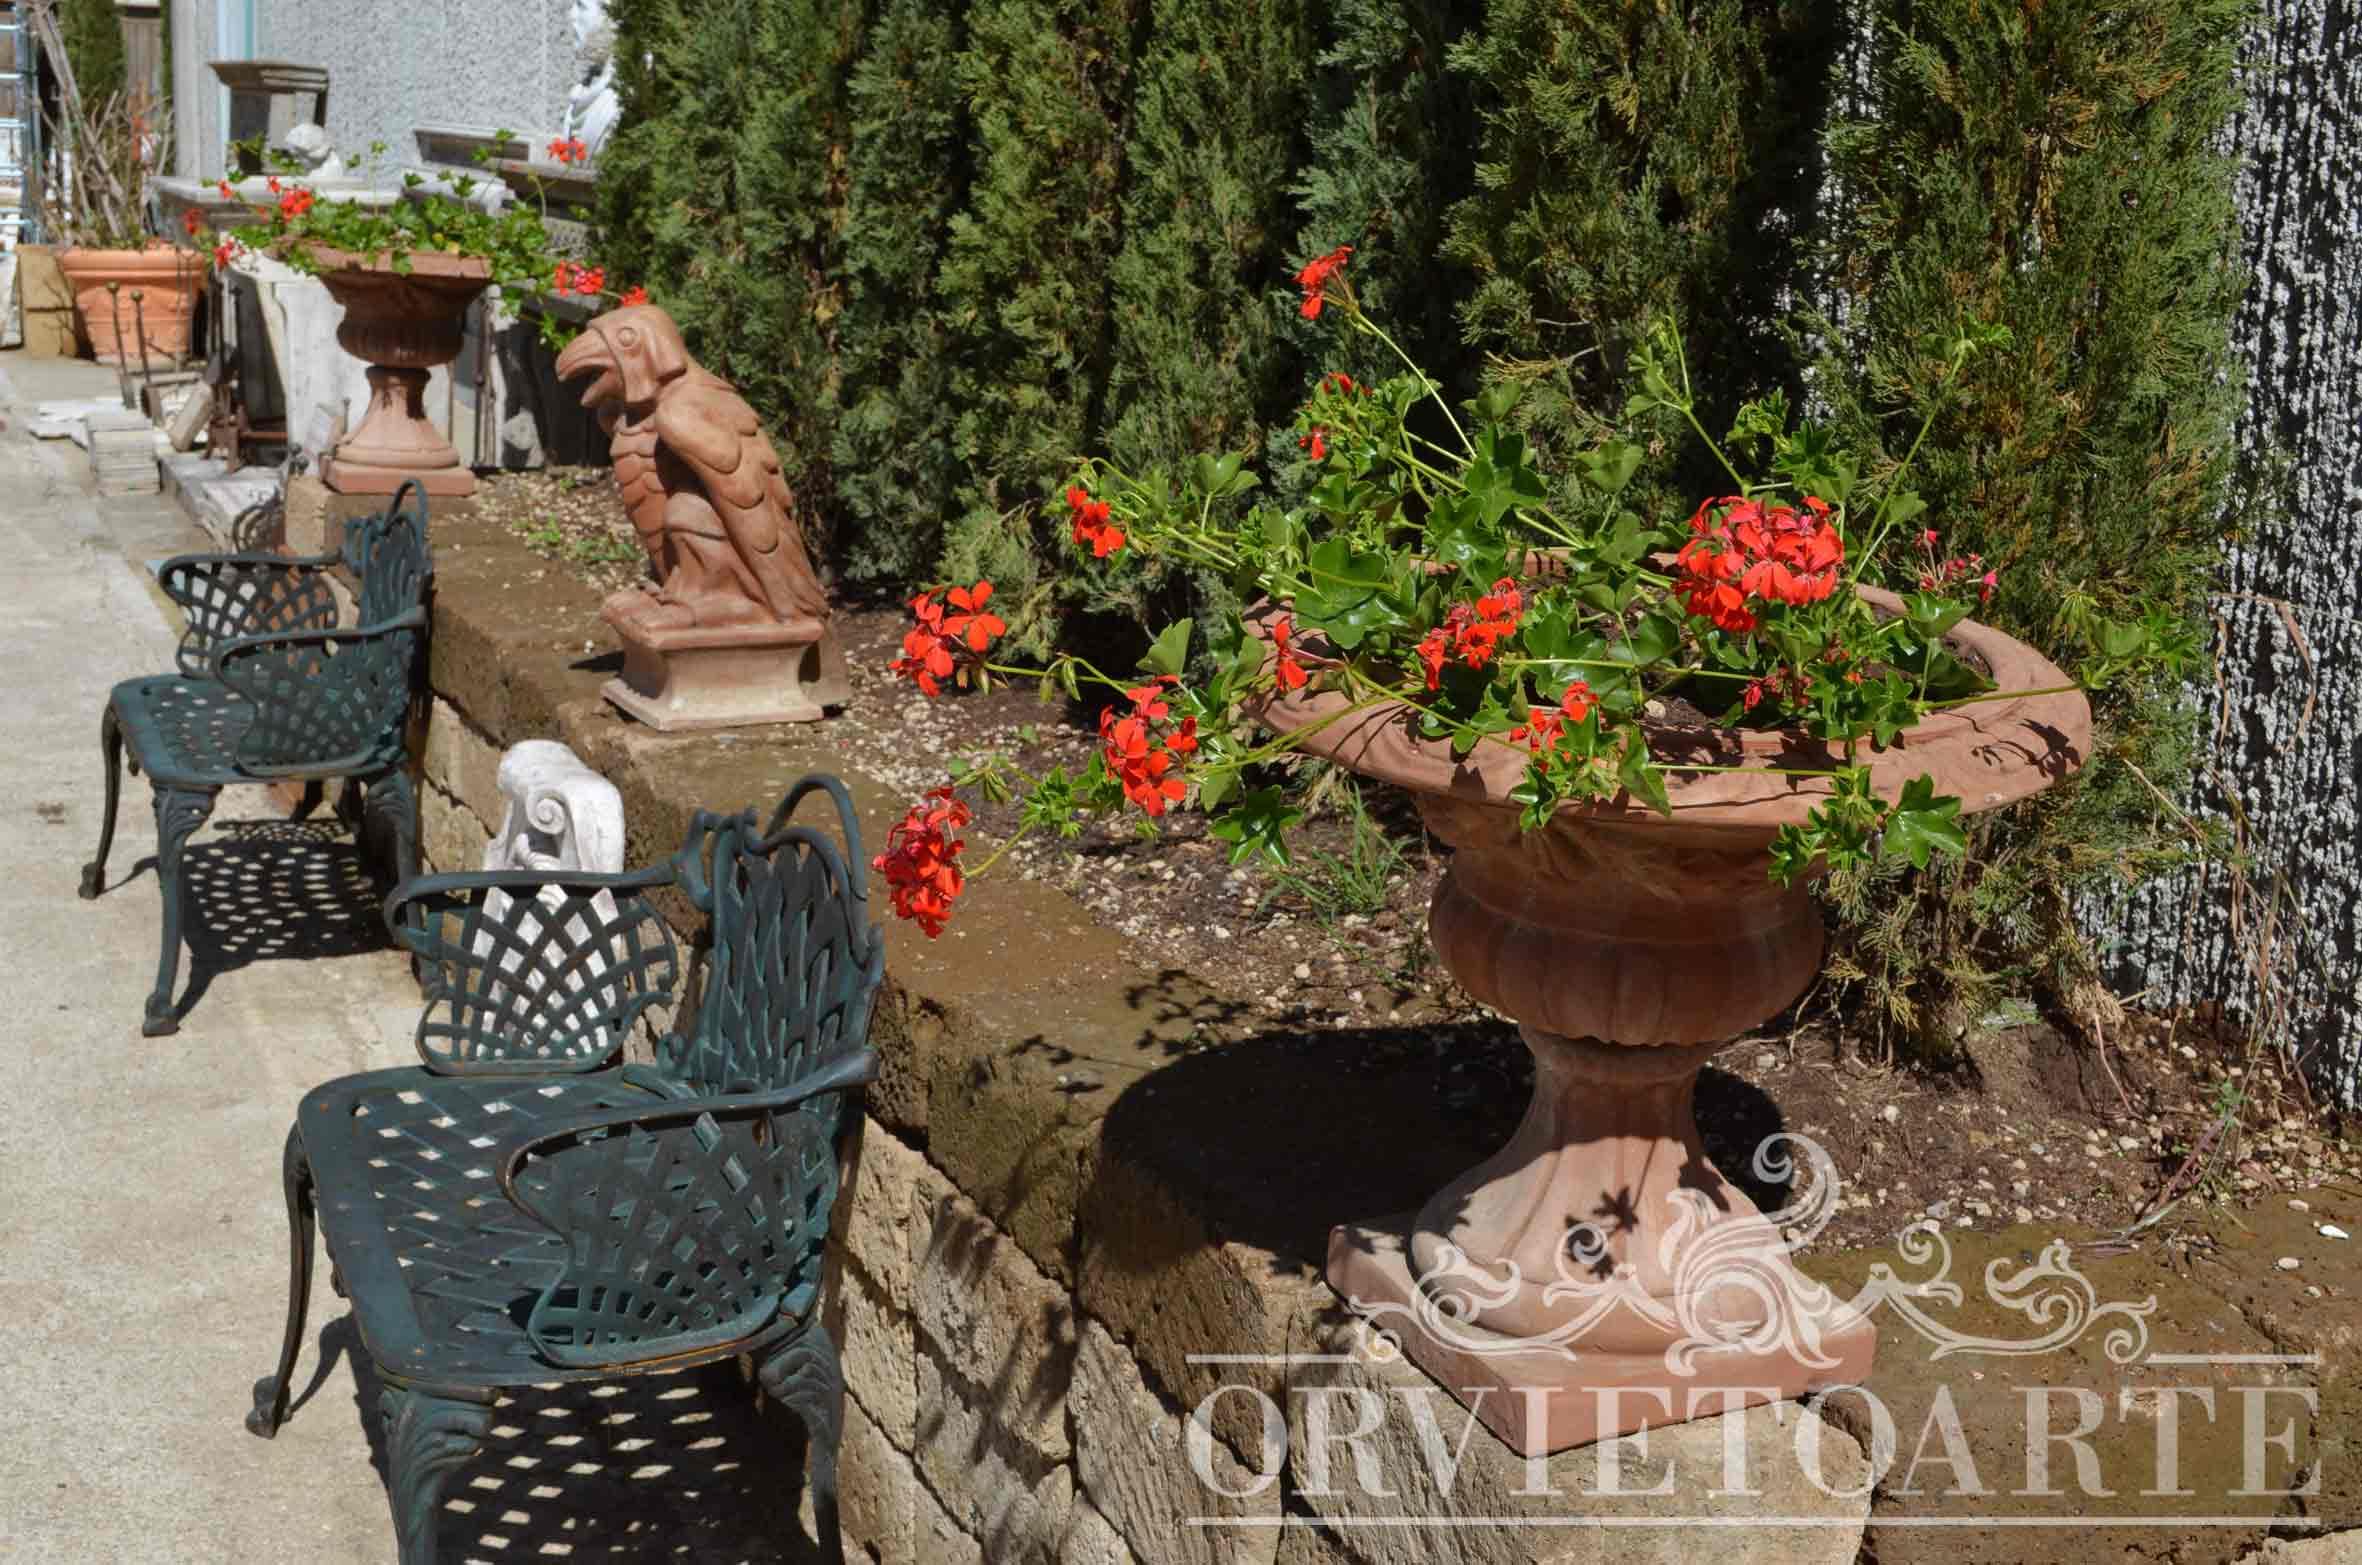 Vasi terracotta da giardino vaso da giardino basso in - Gardenia pianta da interno o esterno ...